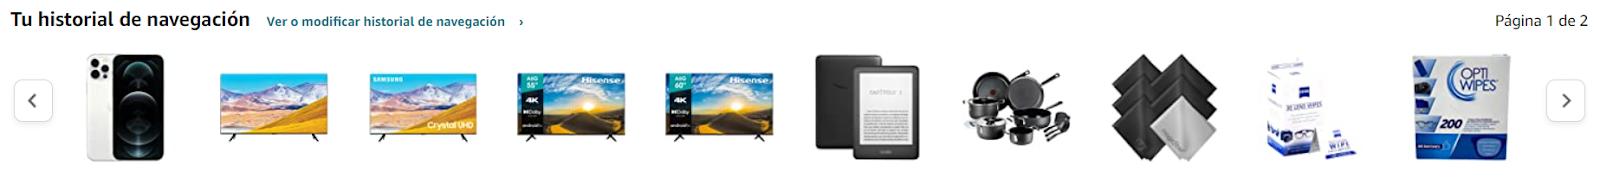 personalizacion ecommerce amazon